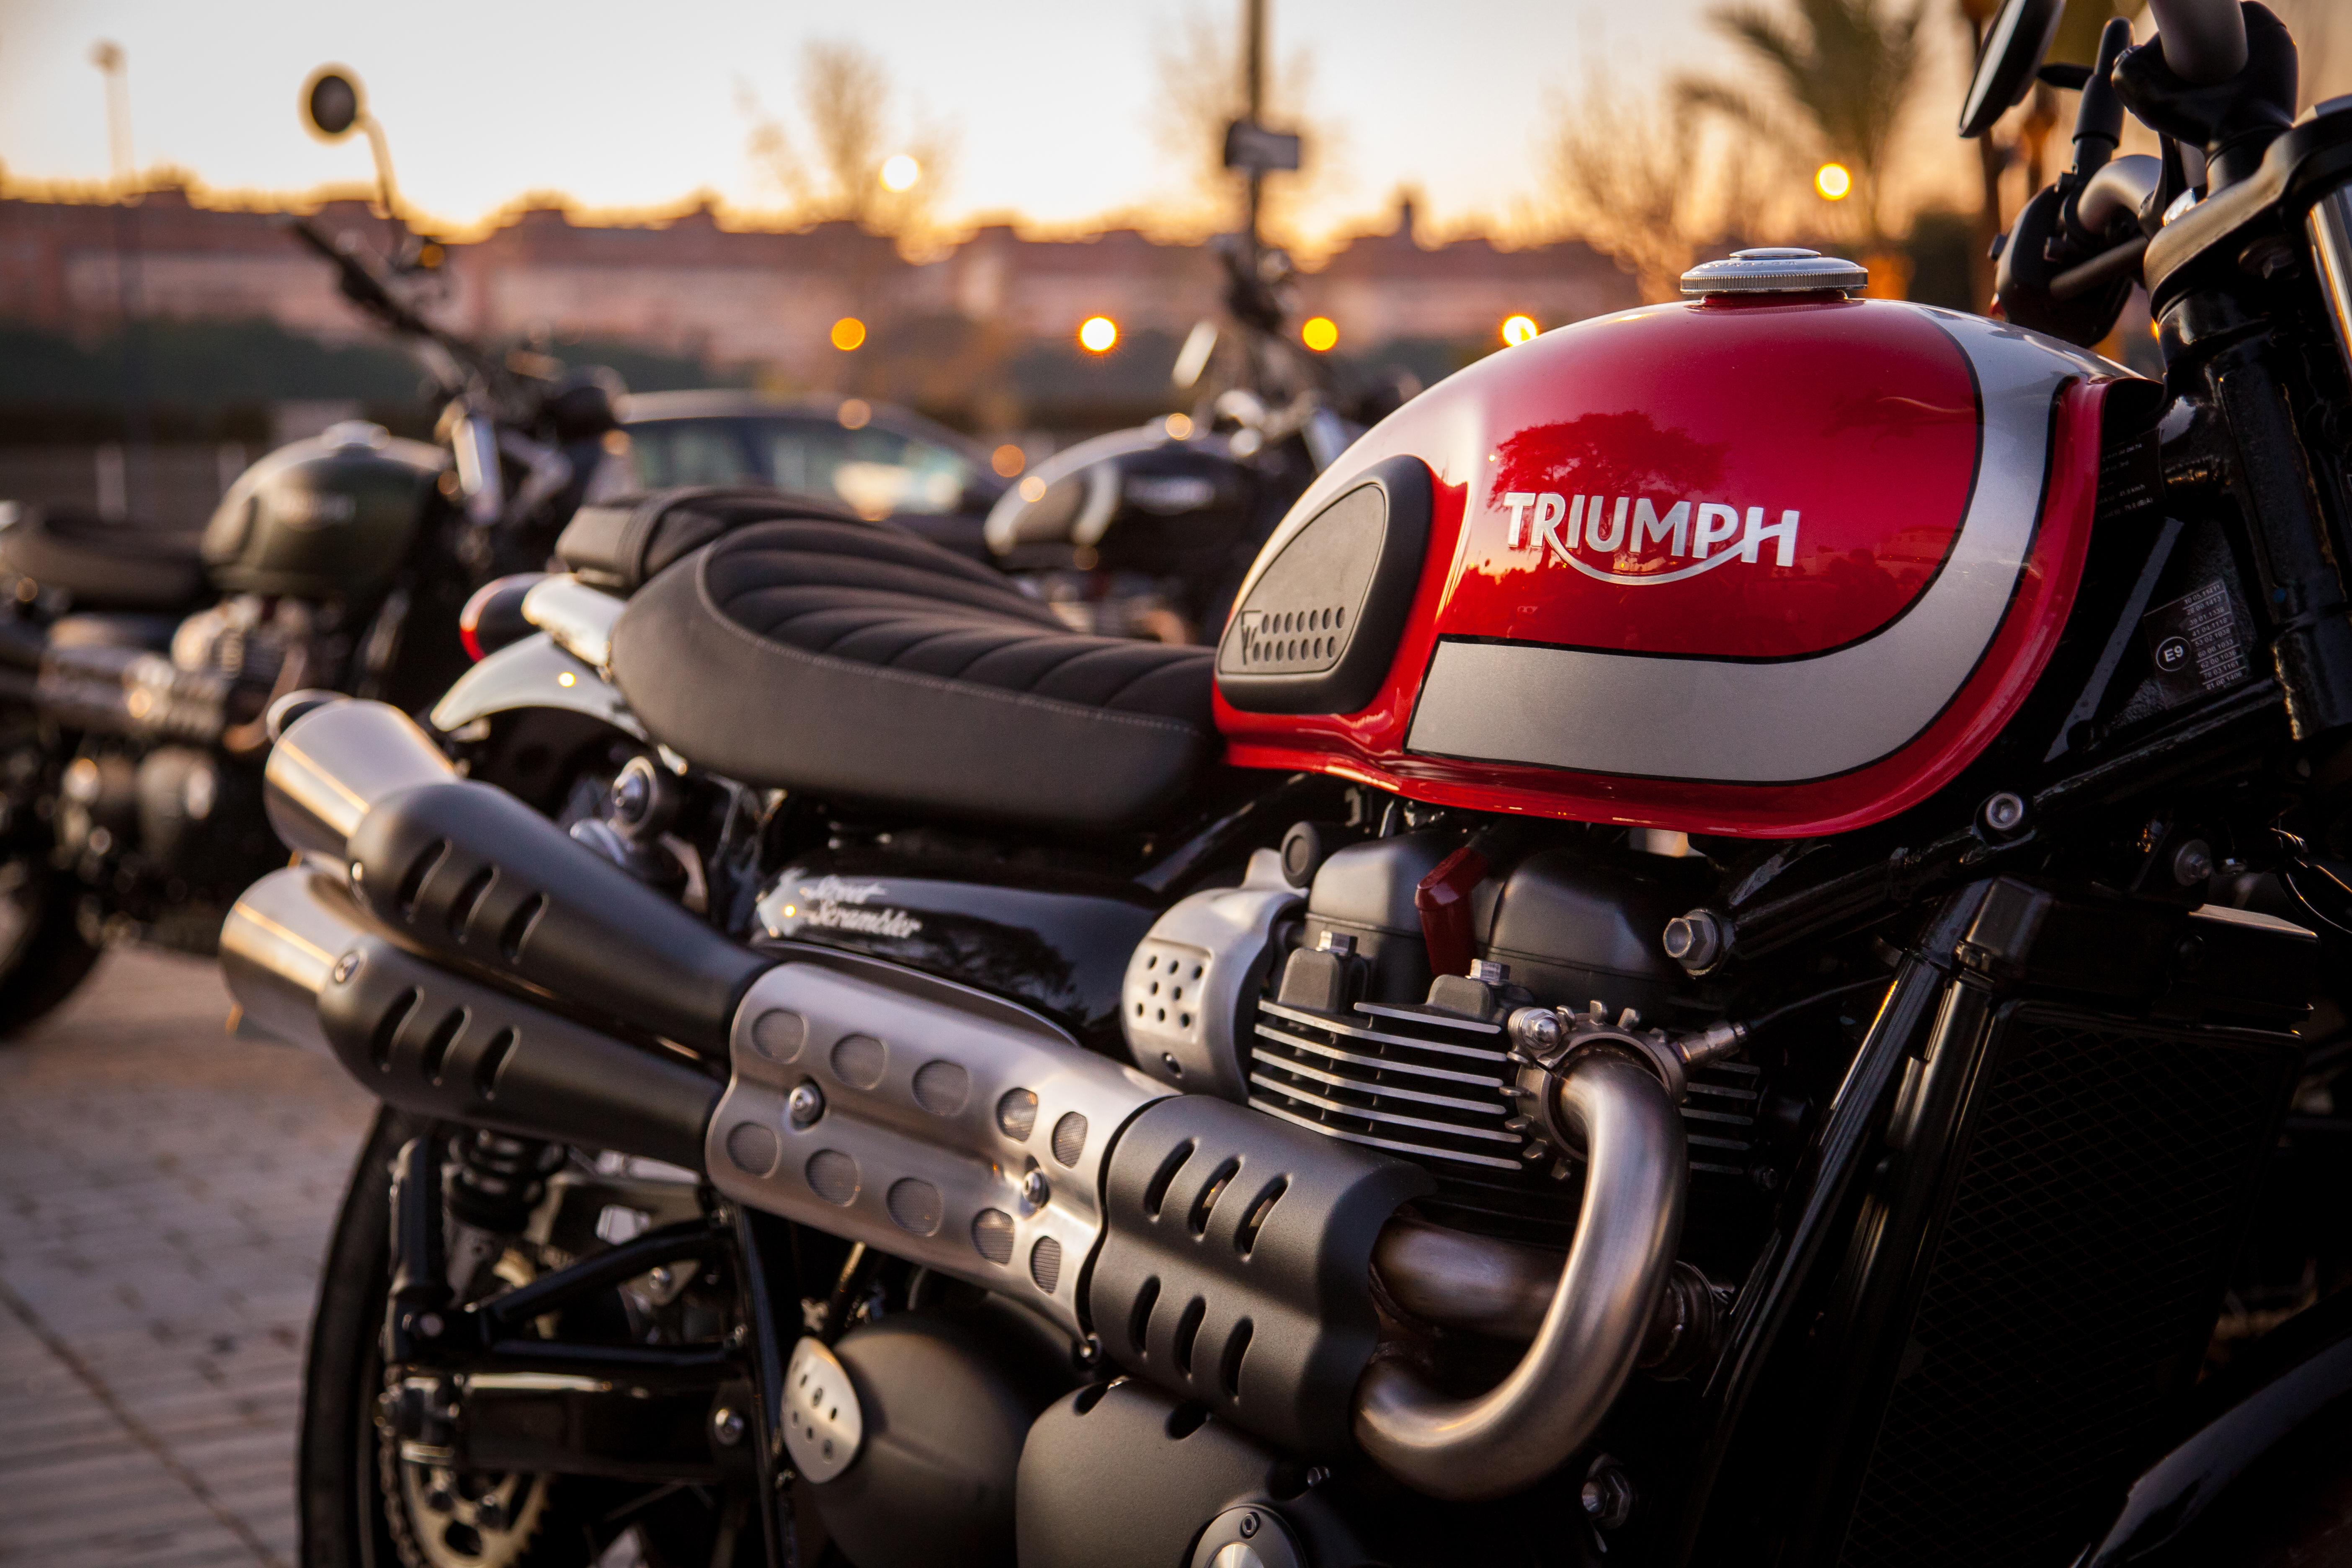 Marvelous 2017 Triumph Scrambler First Ride Review Revzilla Machost Co Dining Chair Design Ideas Machostcouk